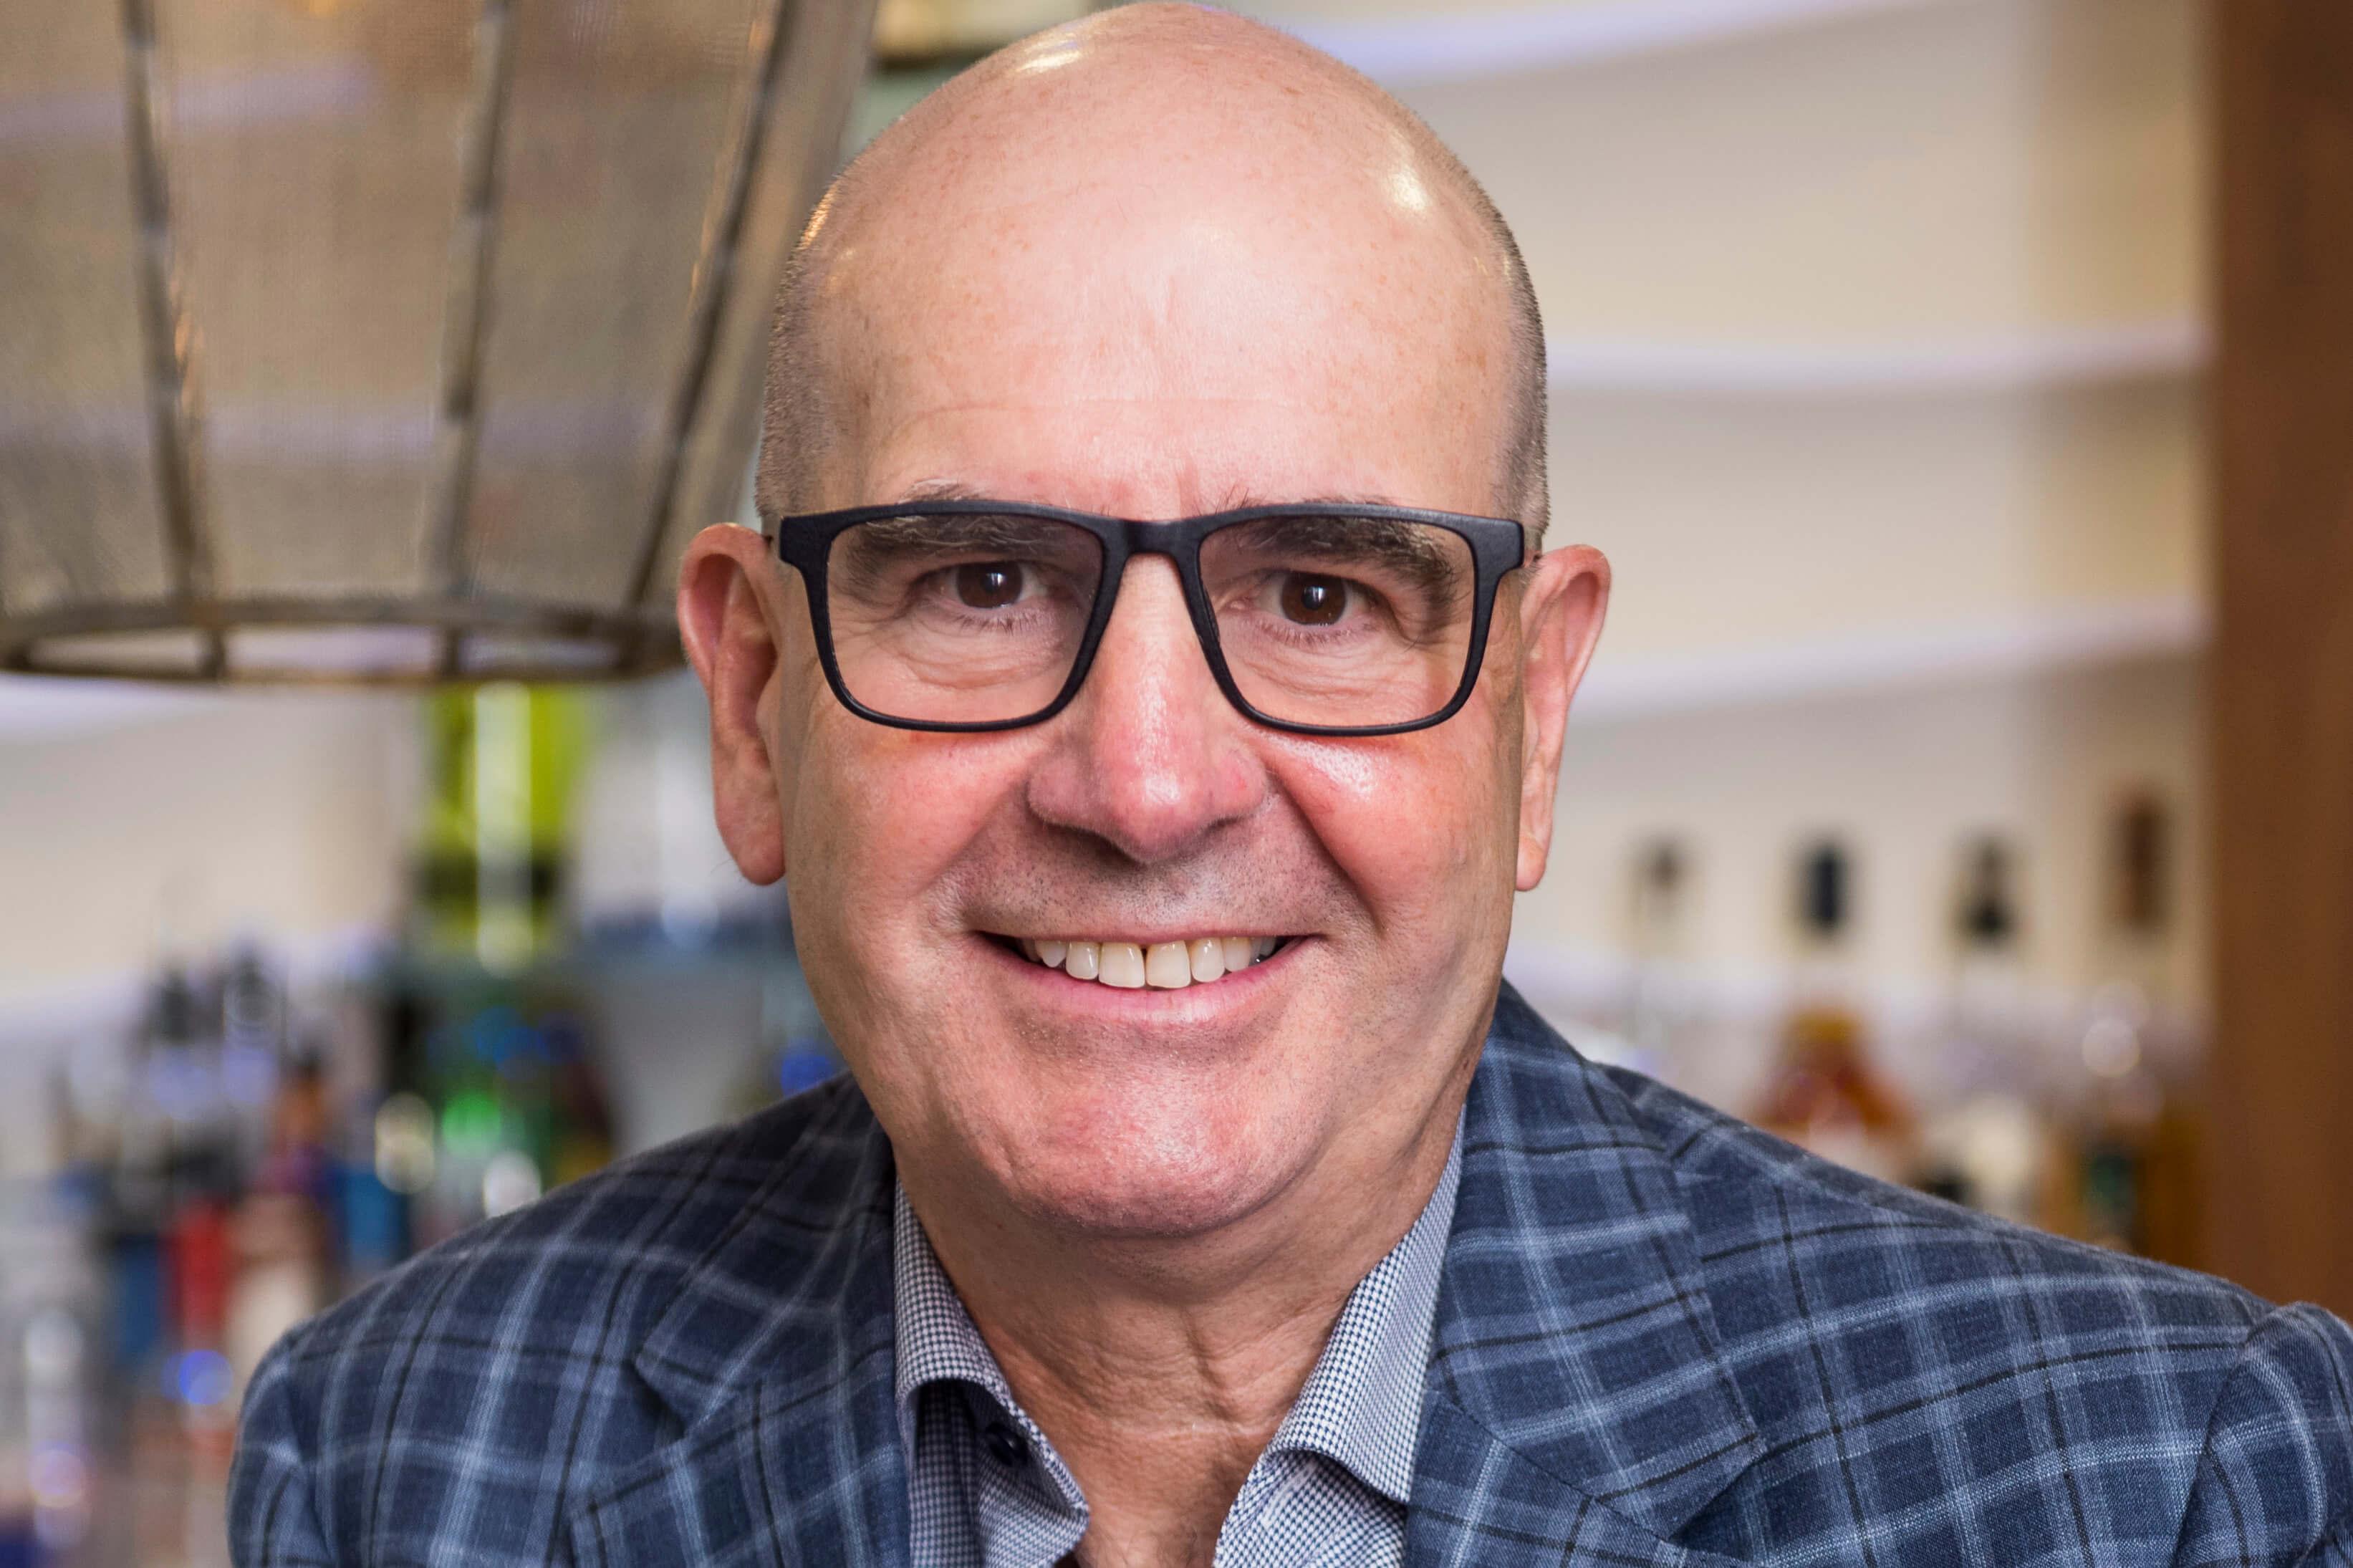 Steve Perez chairman of Global Brands